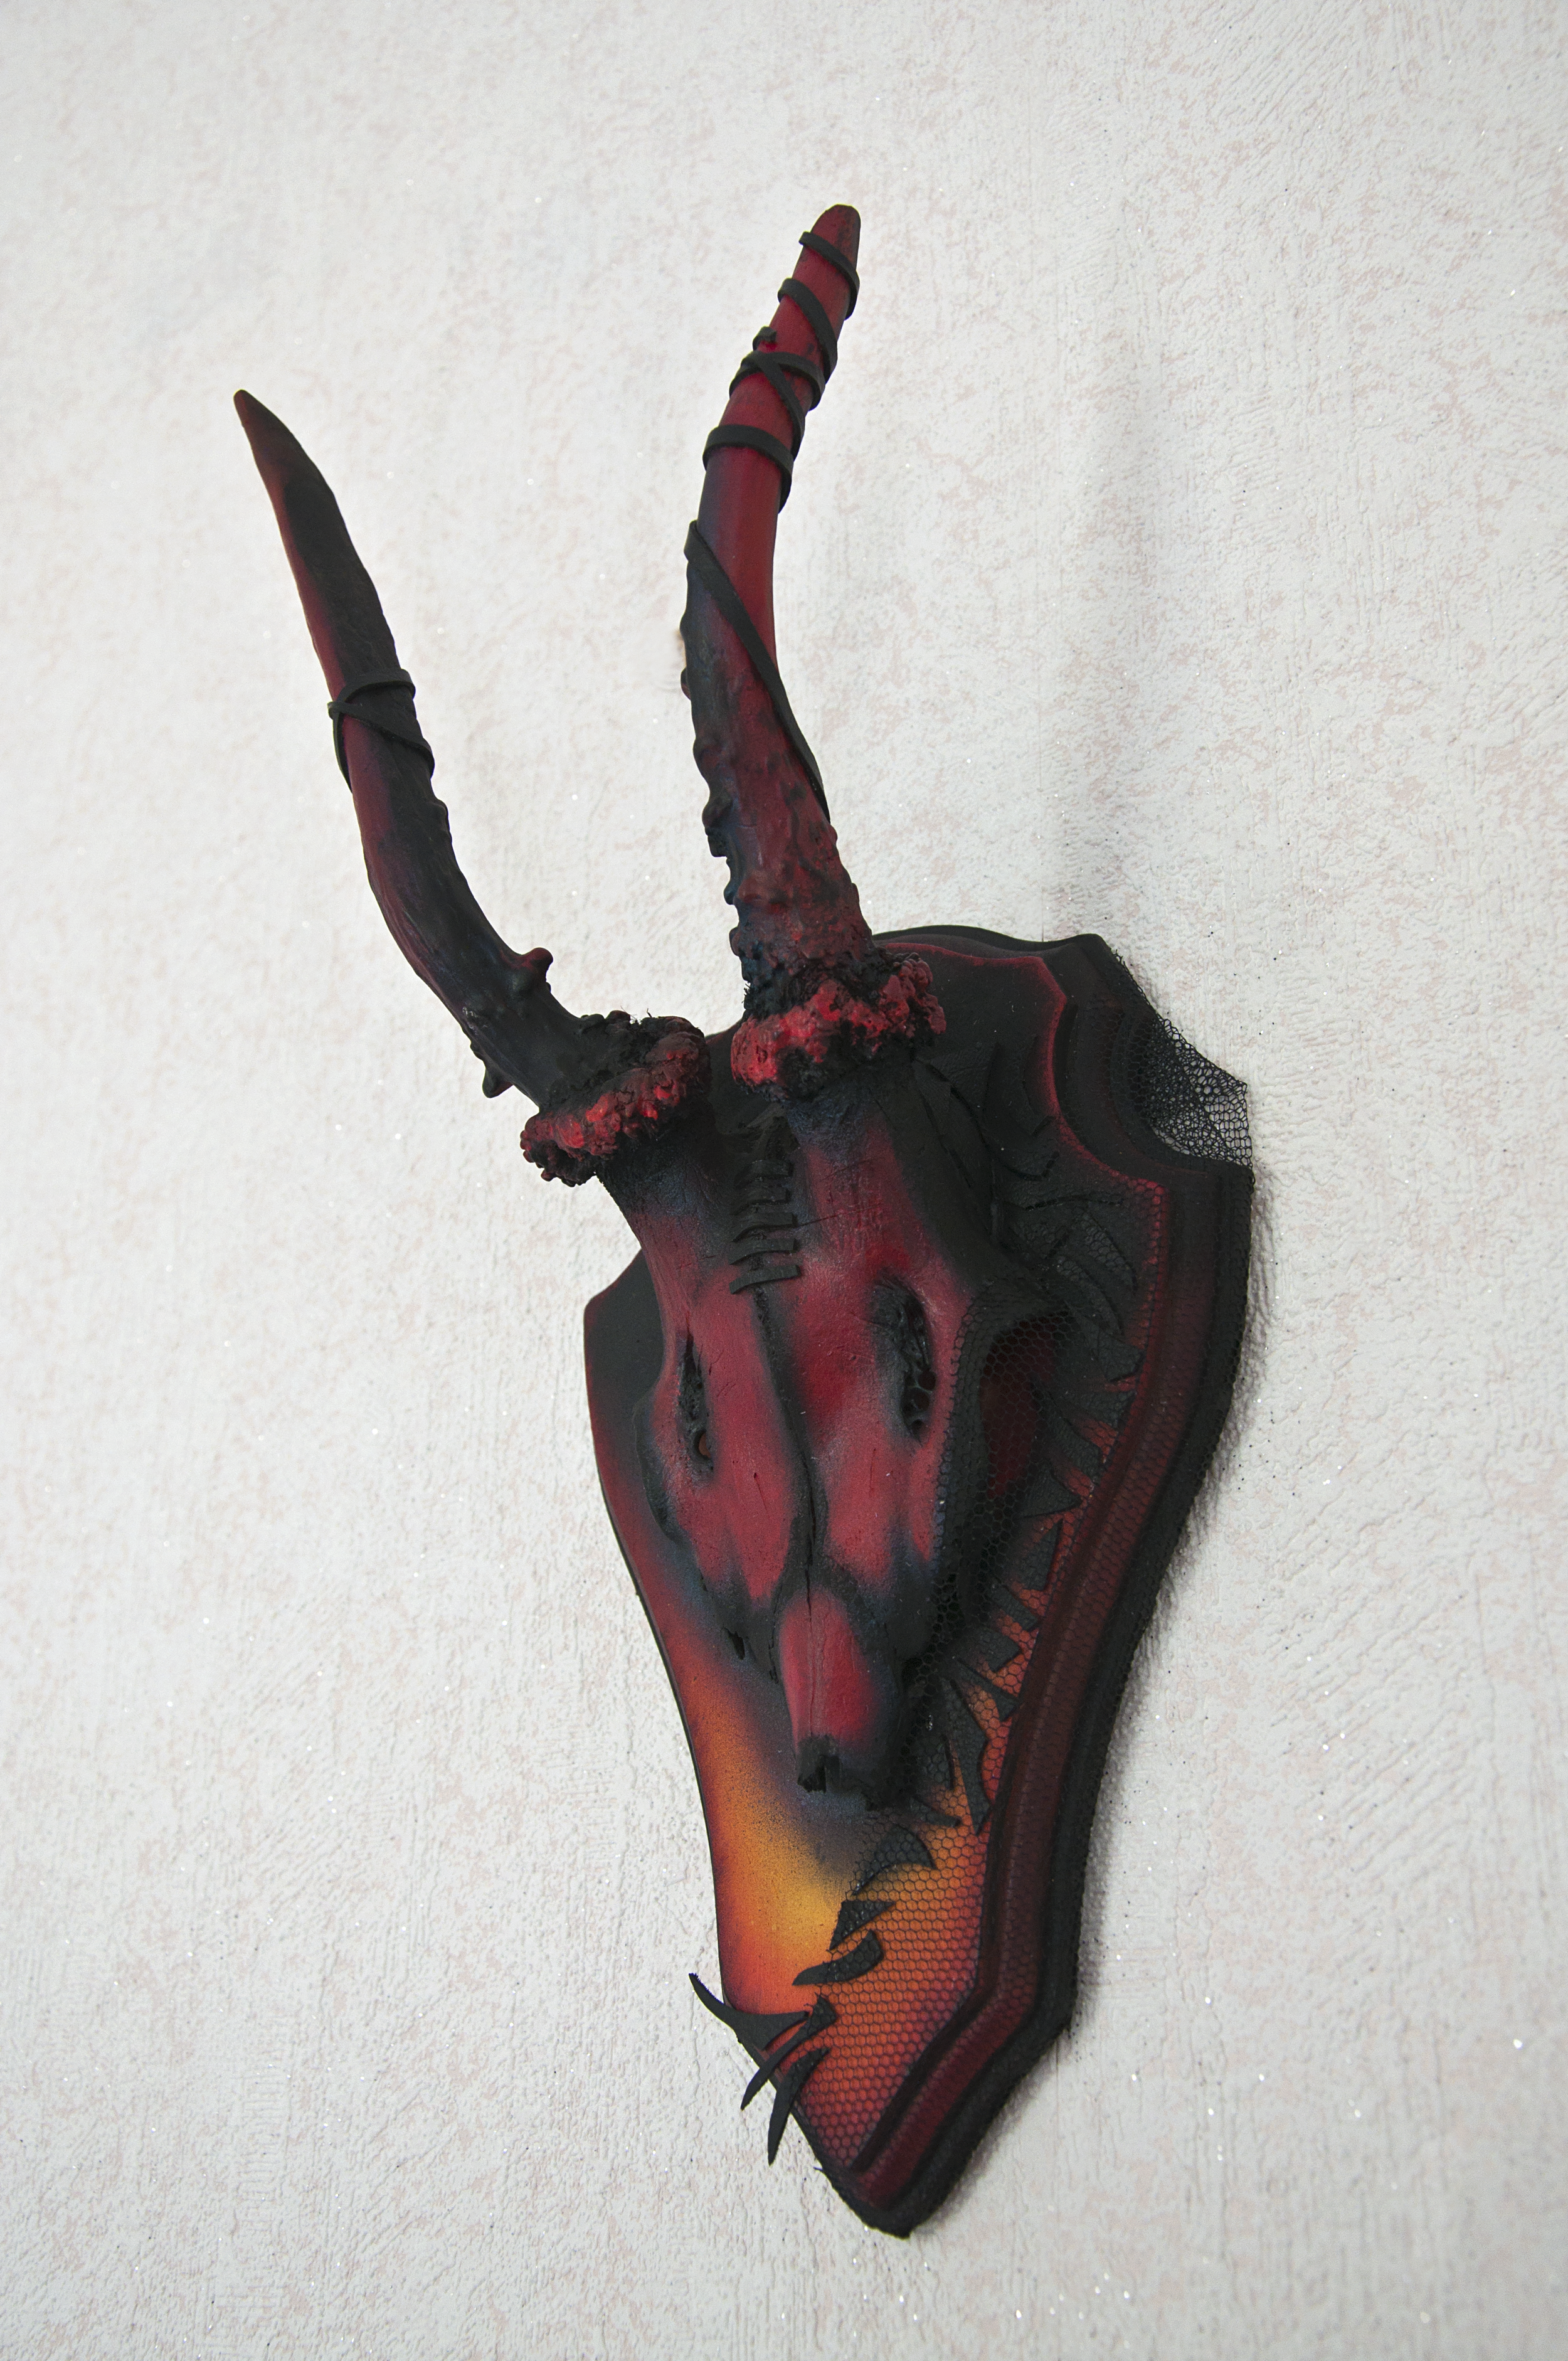 petra-shara-stoor-skull-art-nu-3.png